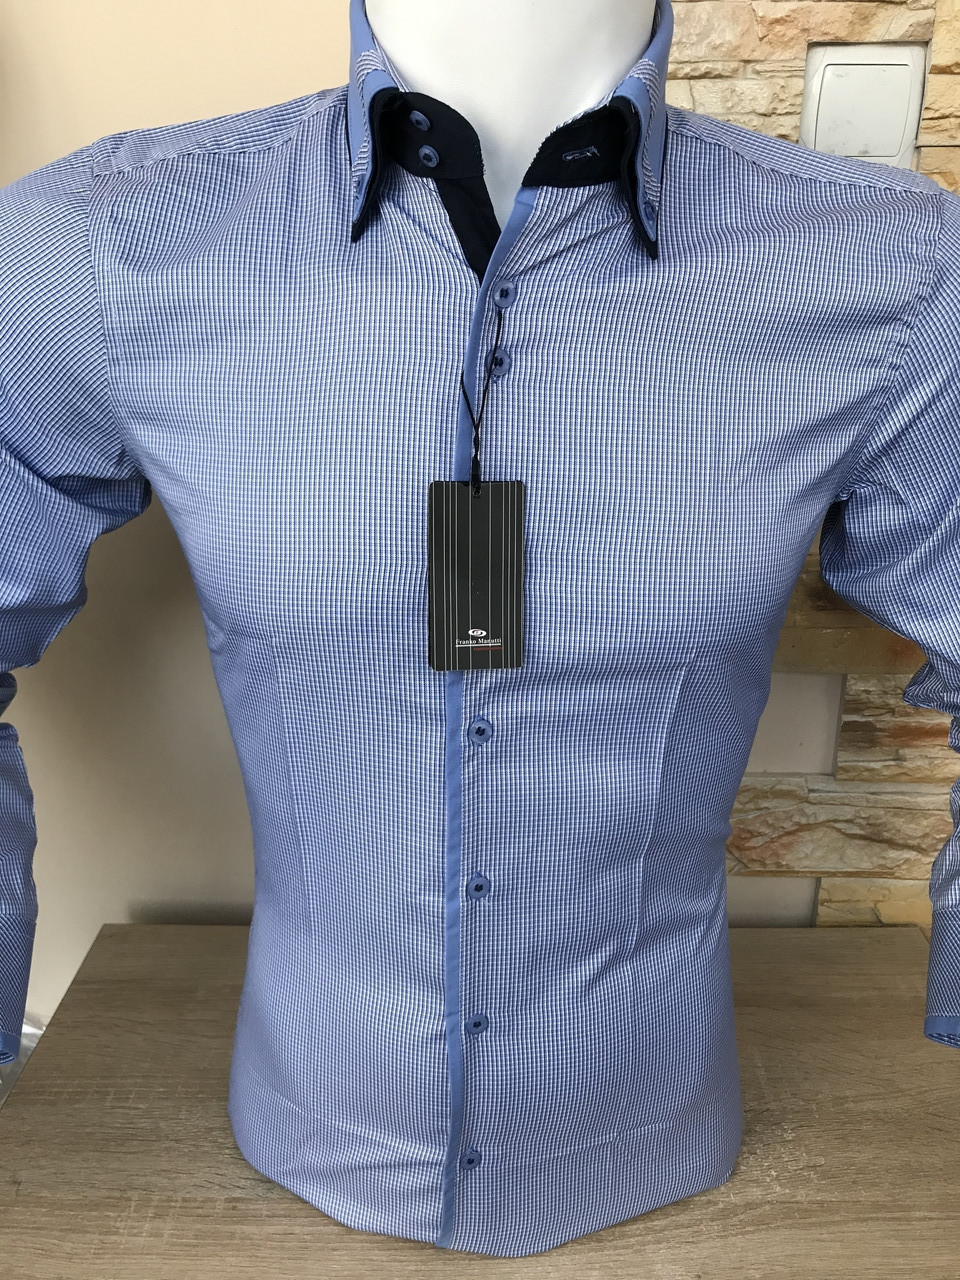 Мужская рубашка в клетку Franko Manutti